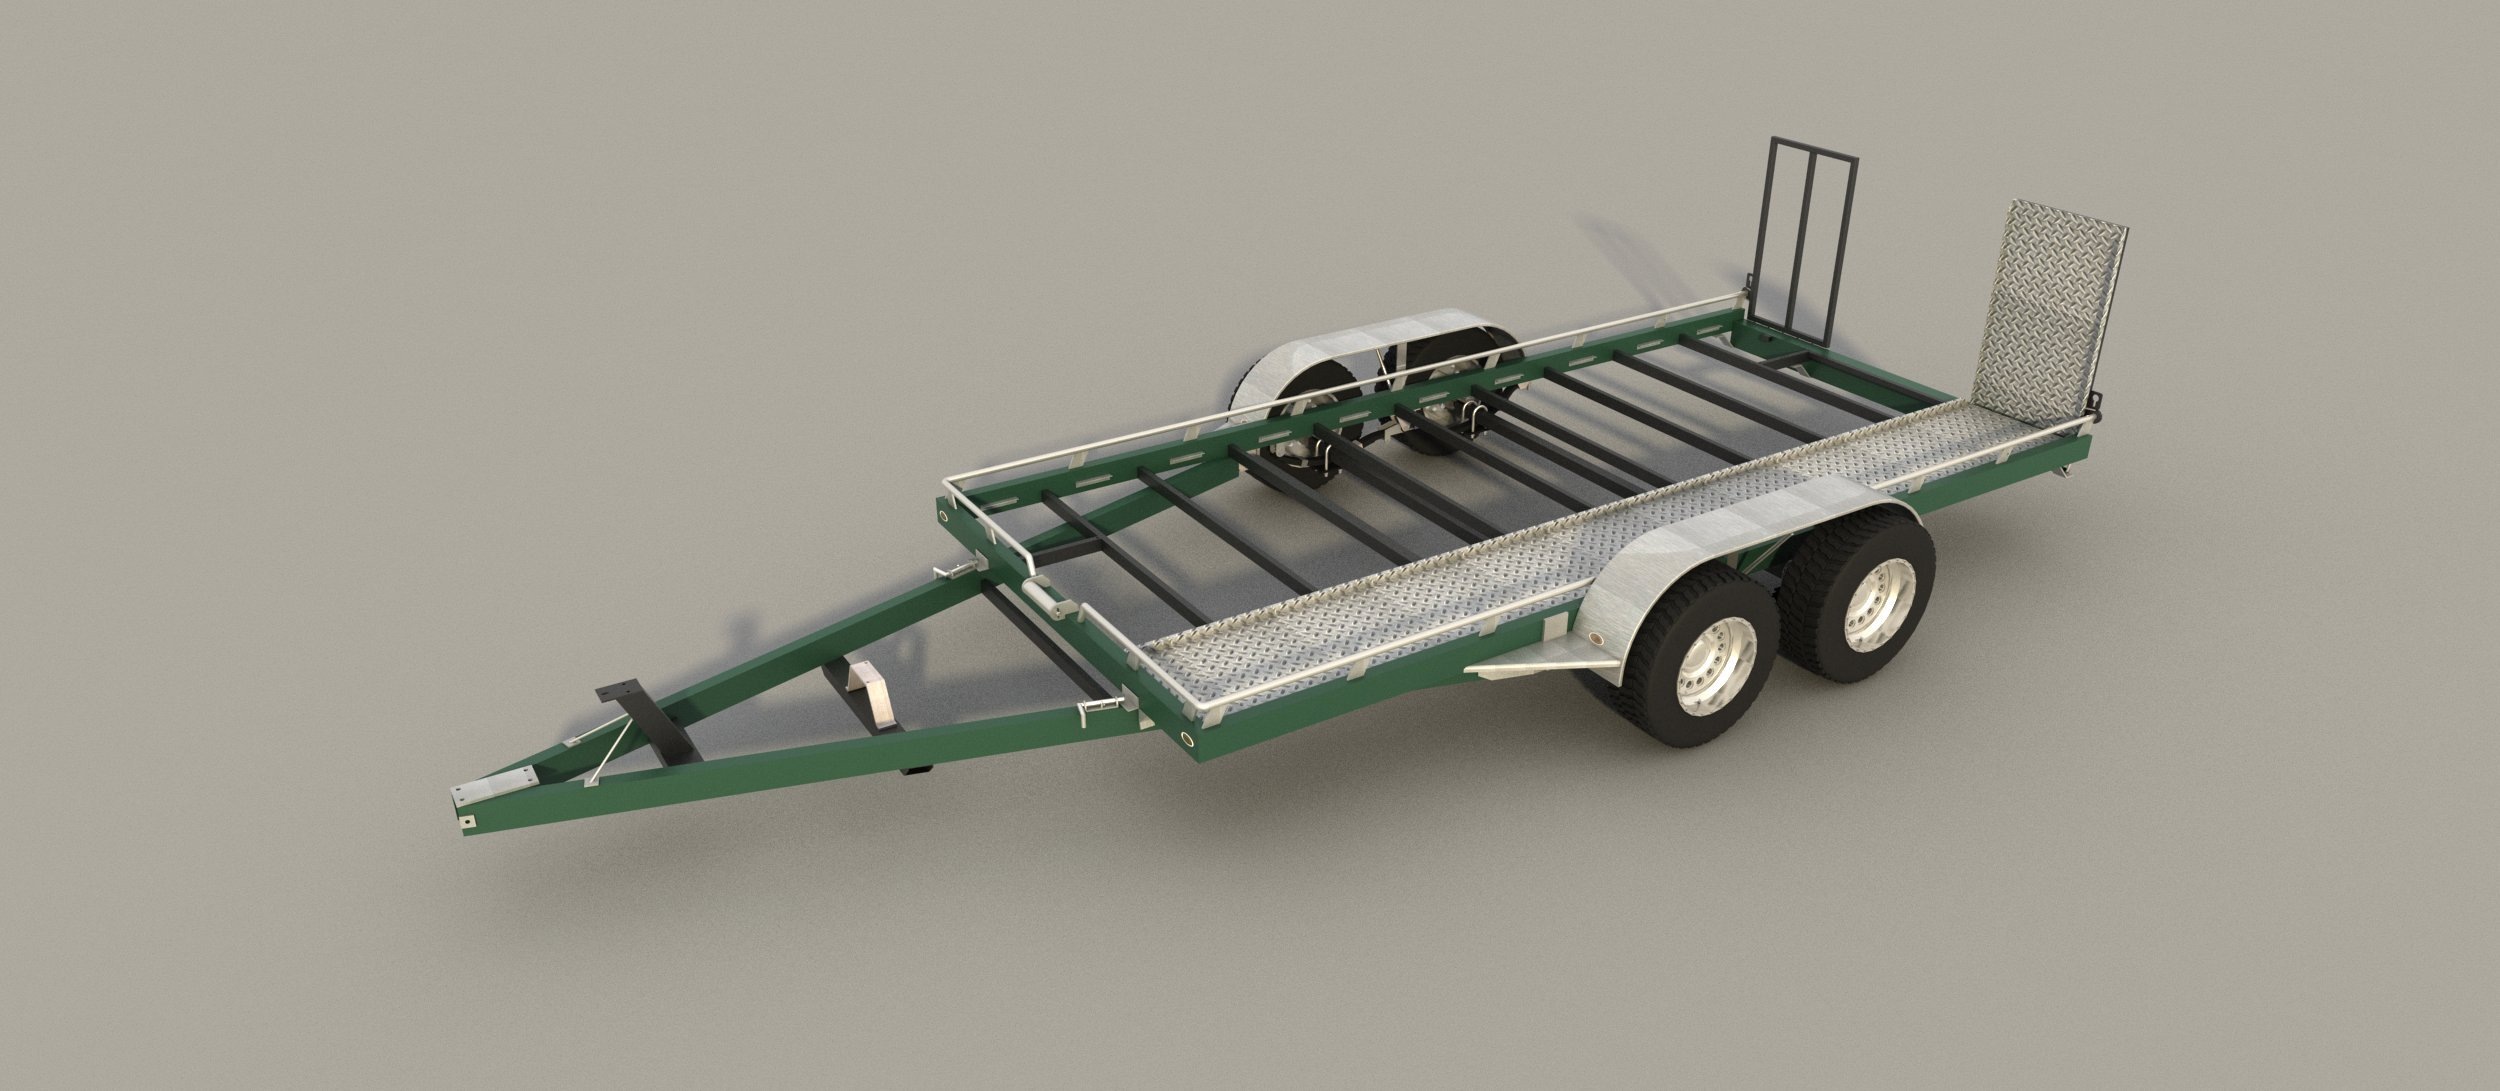 Get Quotations · Build Your Own Open Car Hauler Trailer Plans DIY Homemade Auto Carrier